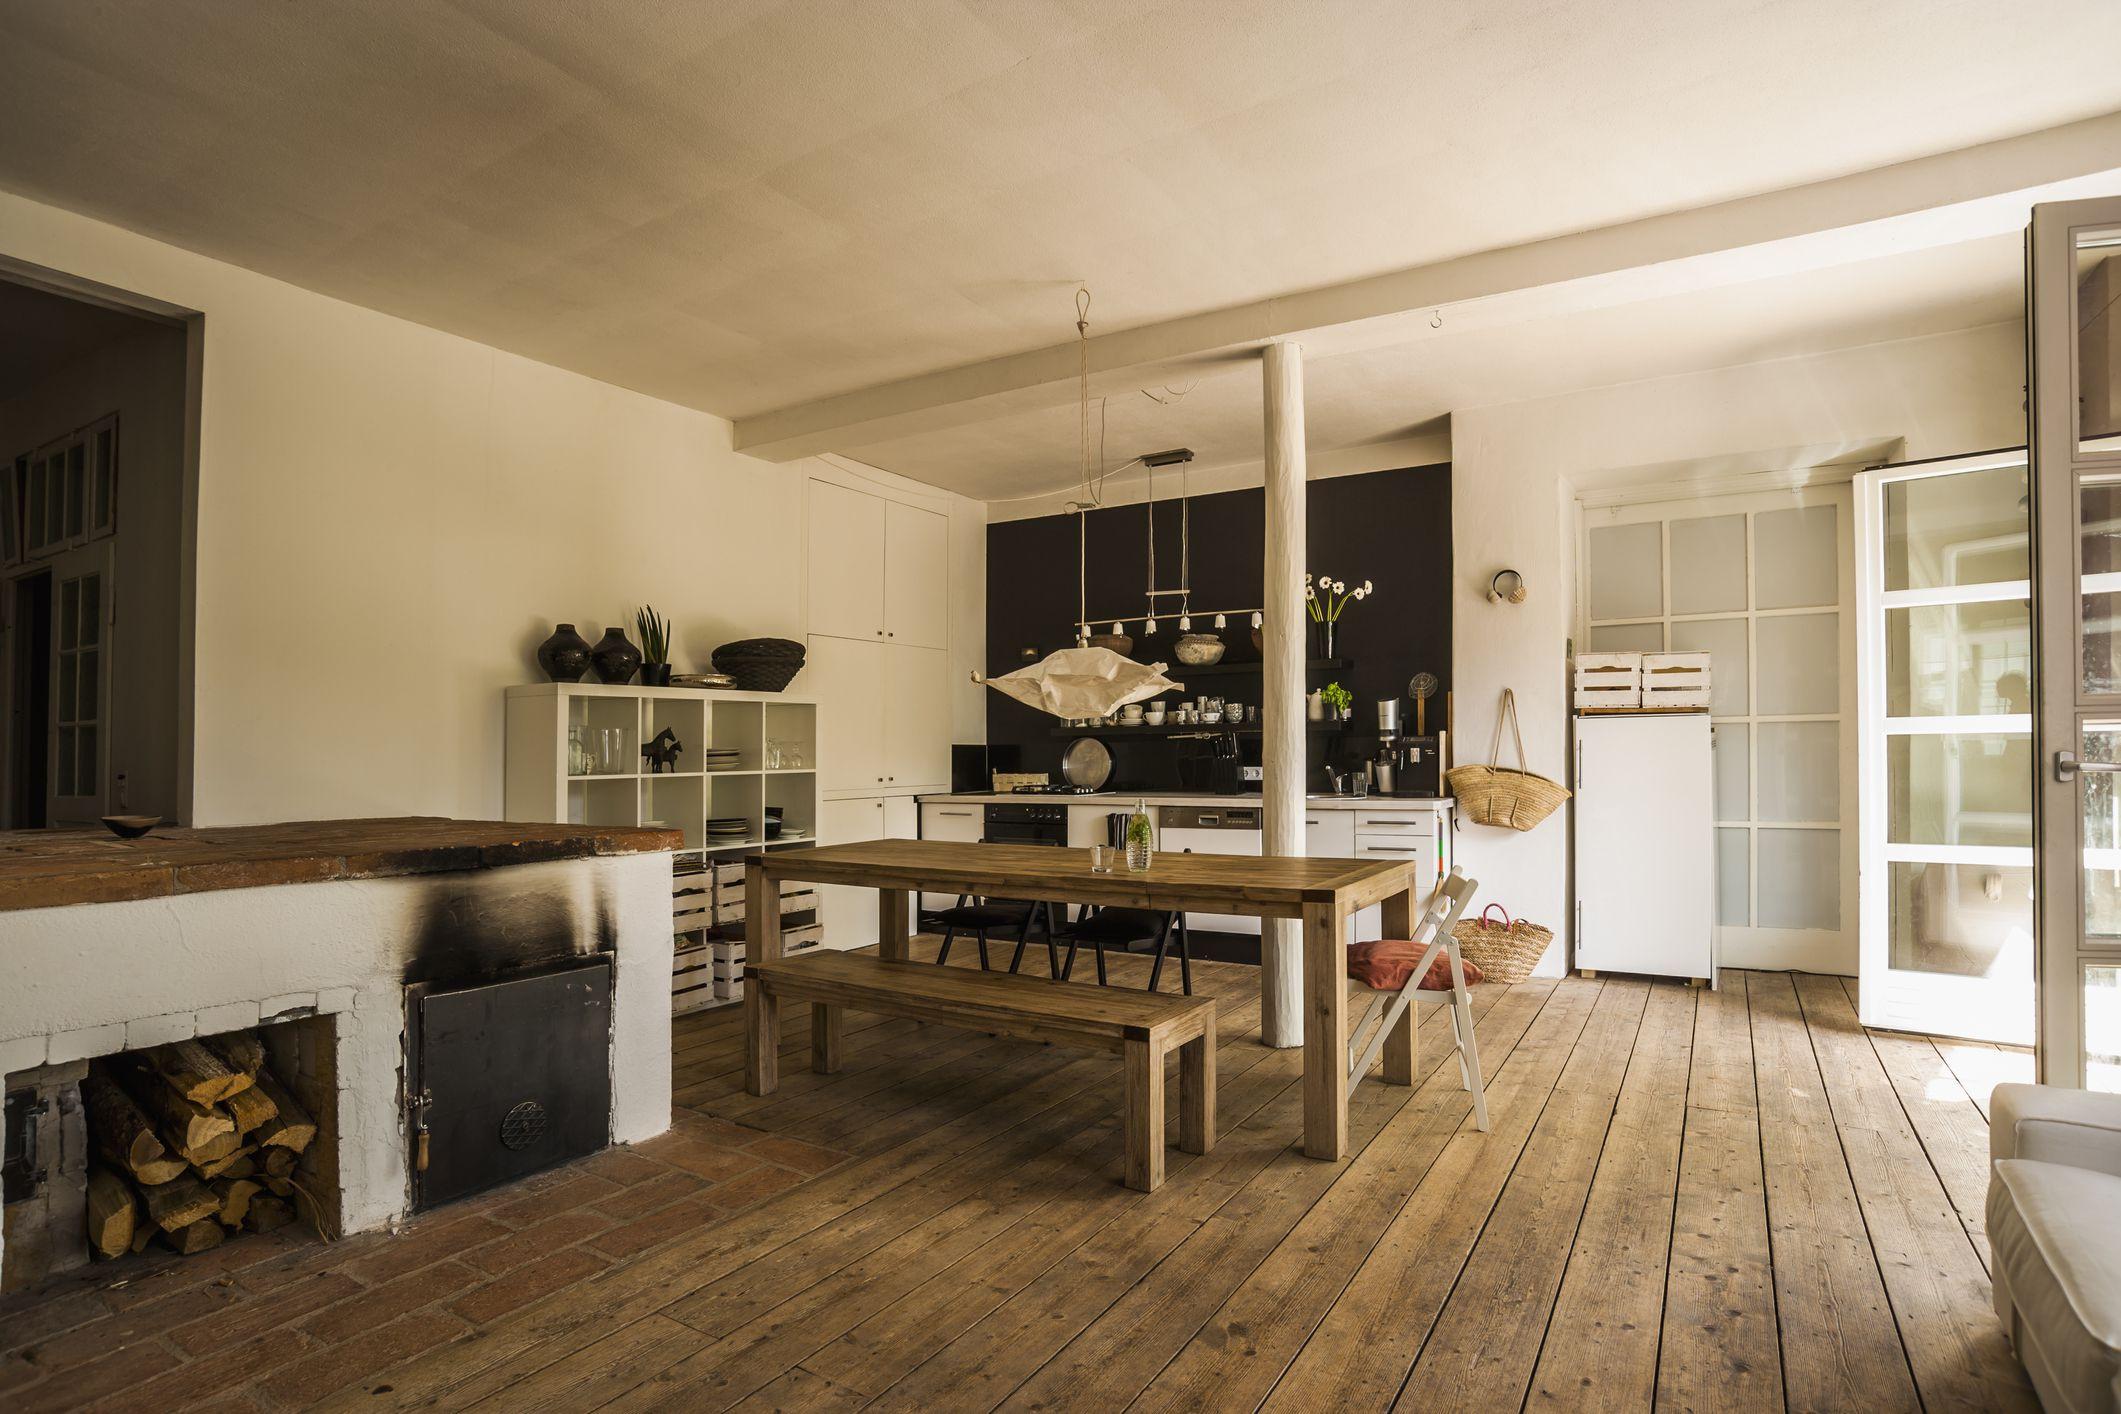 hardwood floor refinishing vs replacing of vinyl wood flooring versus natural hardwood intended for diningroom woodenfloor gettyimages 544546775 590e57565f9b58647043440a